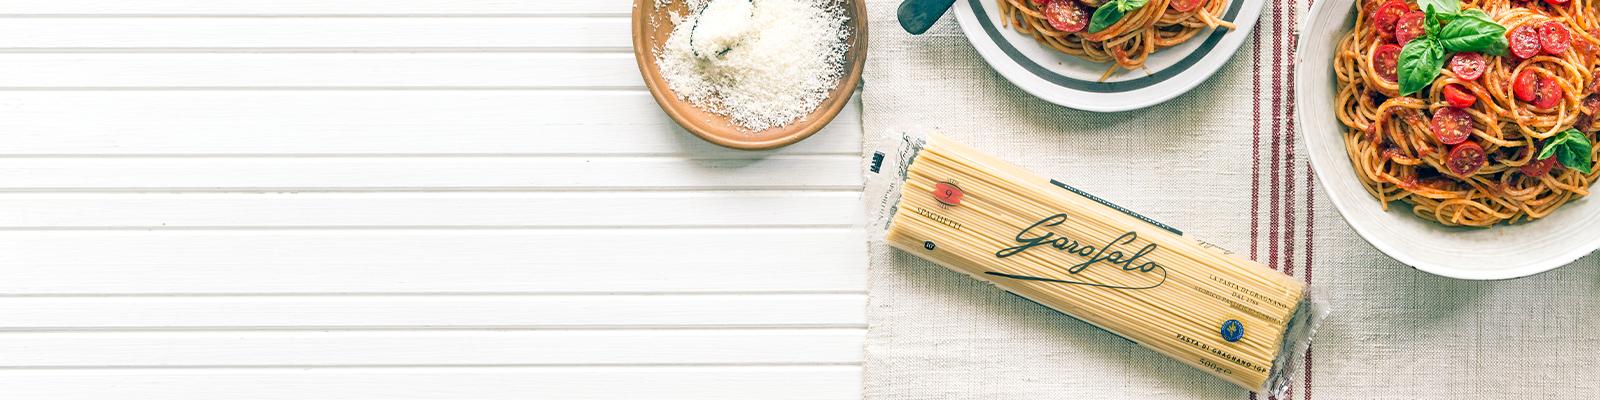 Pasta Garofalo - Pasta Aus Hartweizengriess